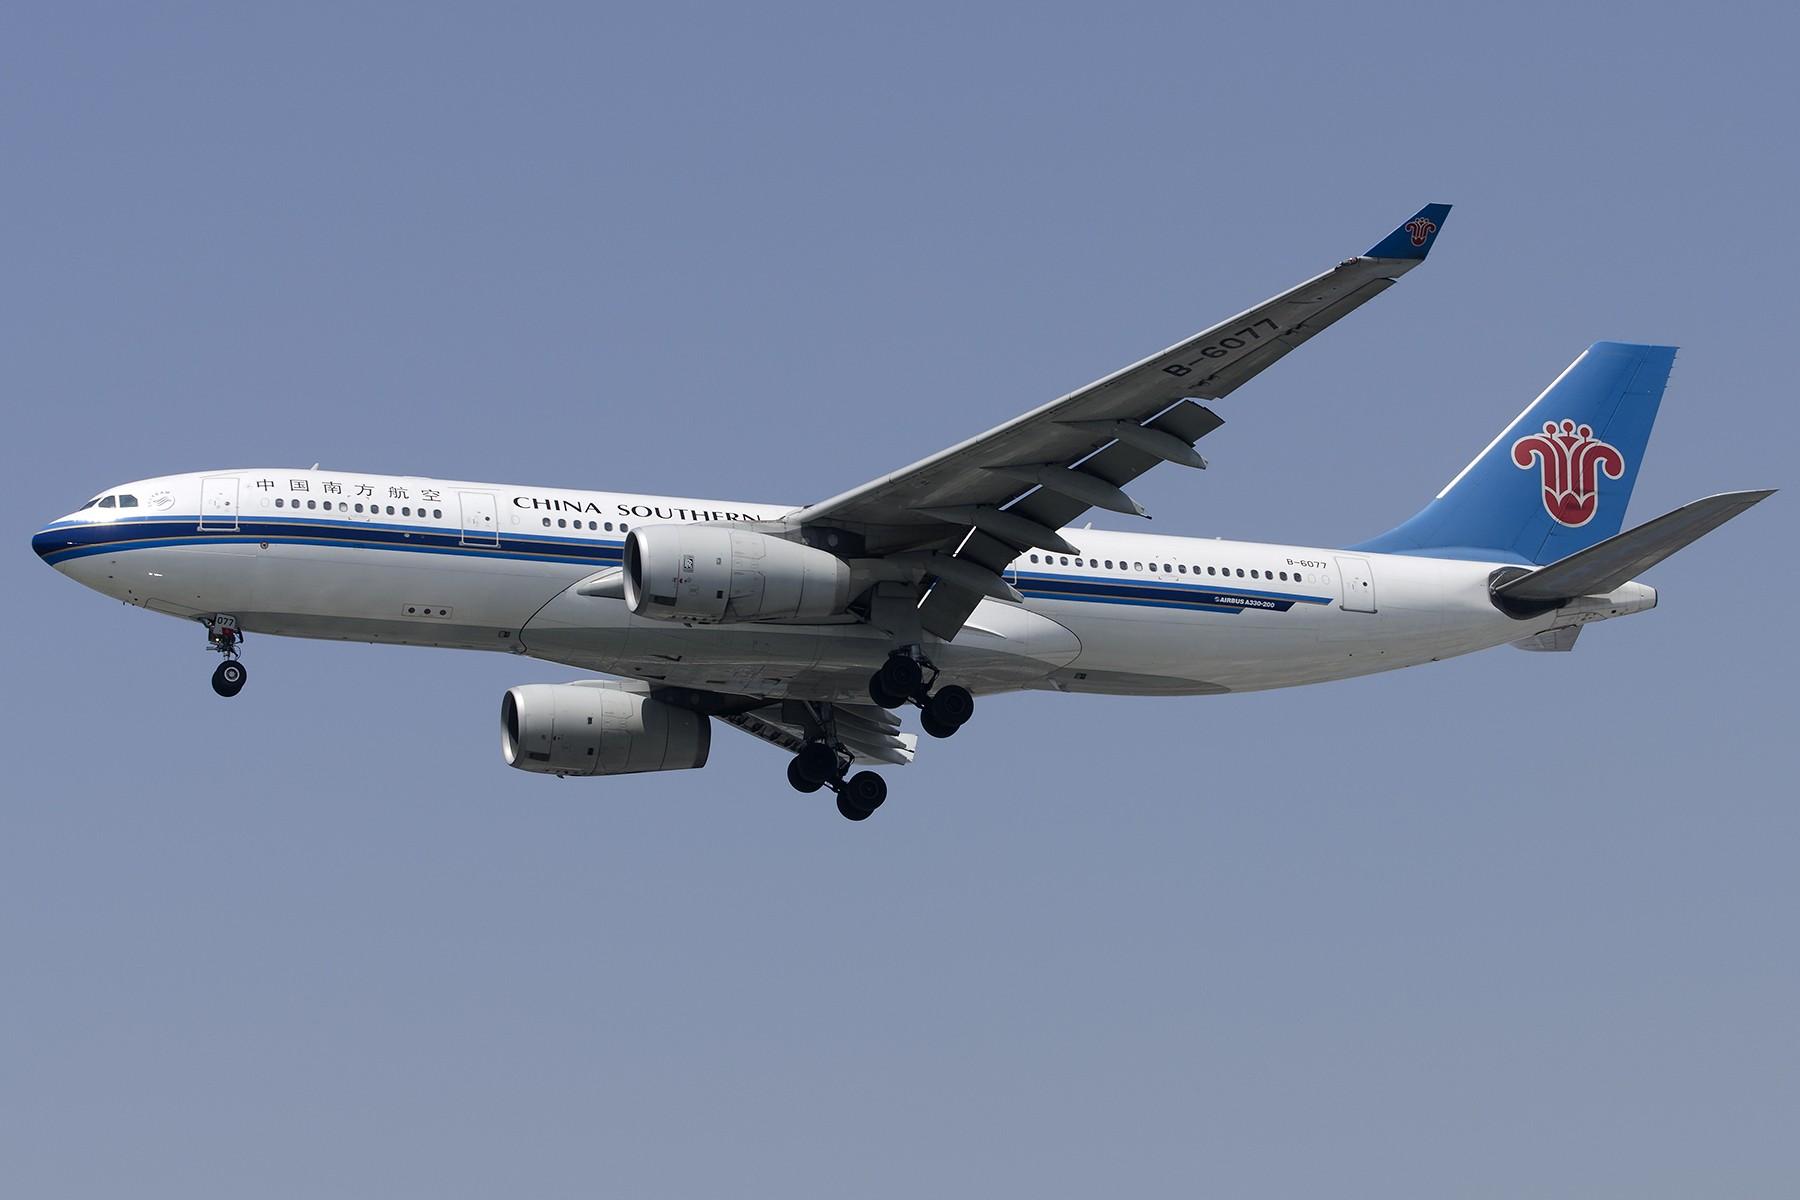 Re:[原创][原创]【SHA拍机*1800大图】4月拍的了,记得那天好货还挺多 AIRBUS A330-200 B-6077 中国上海虹桥国际机场